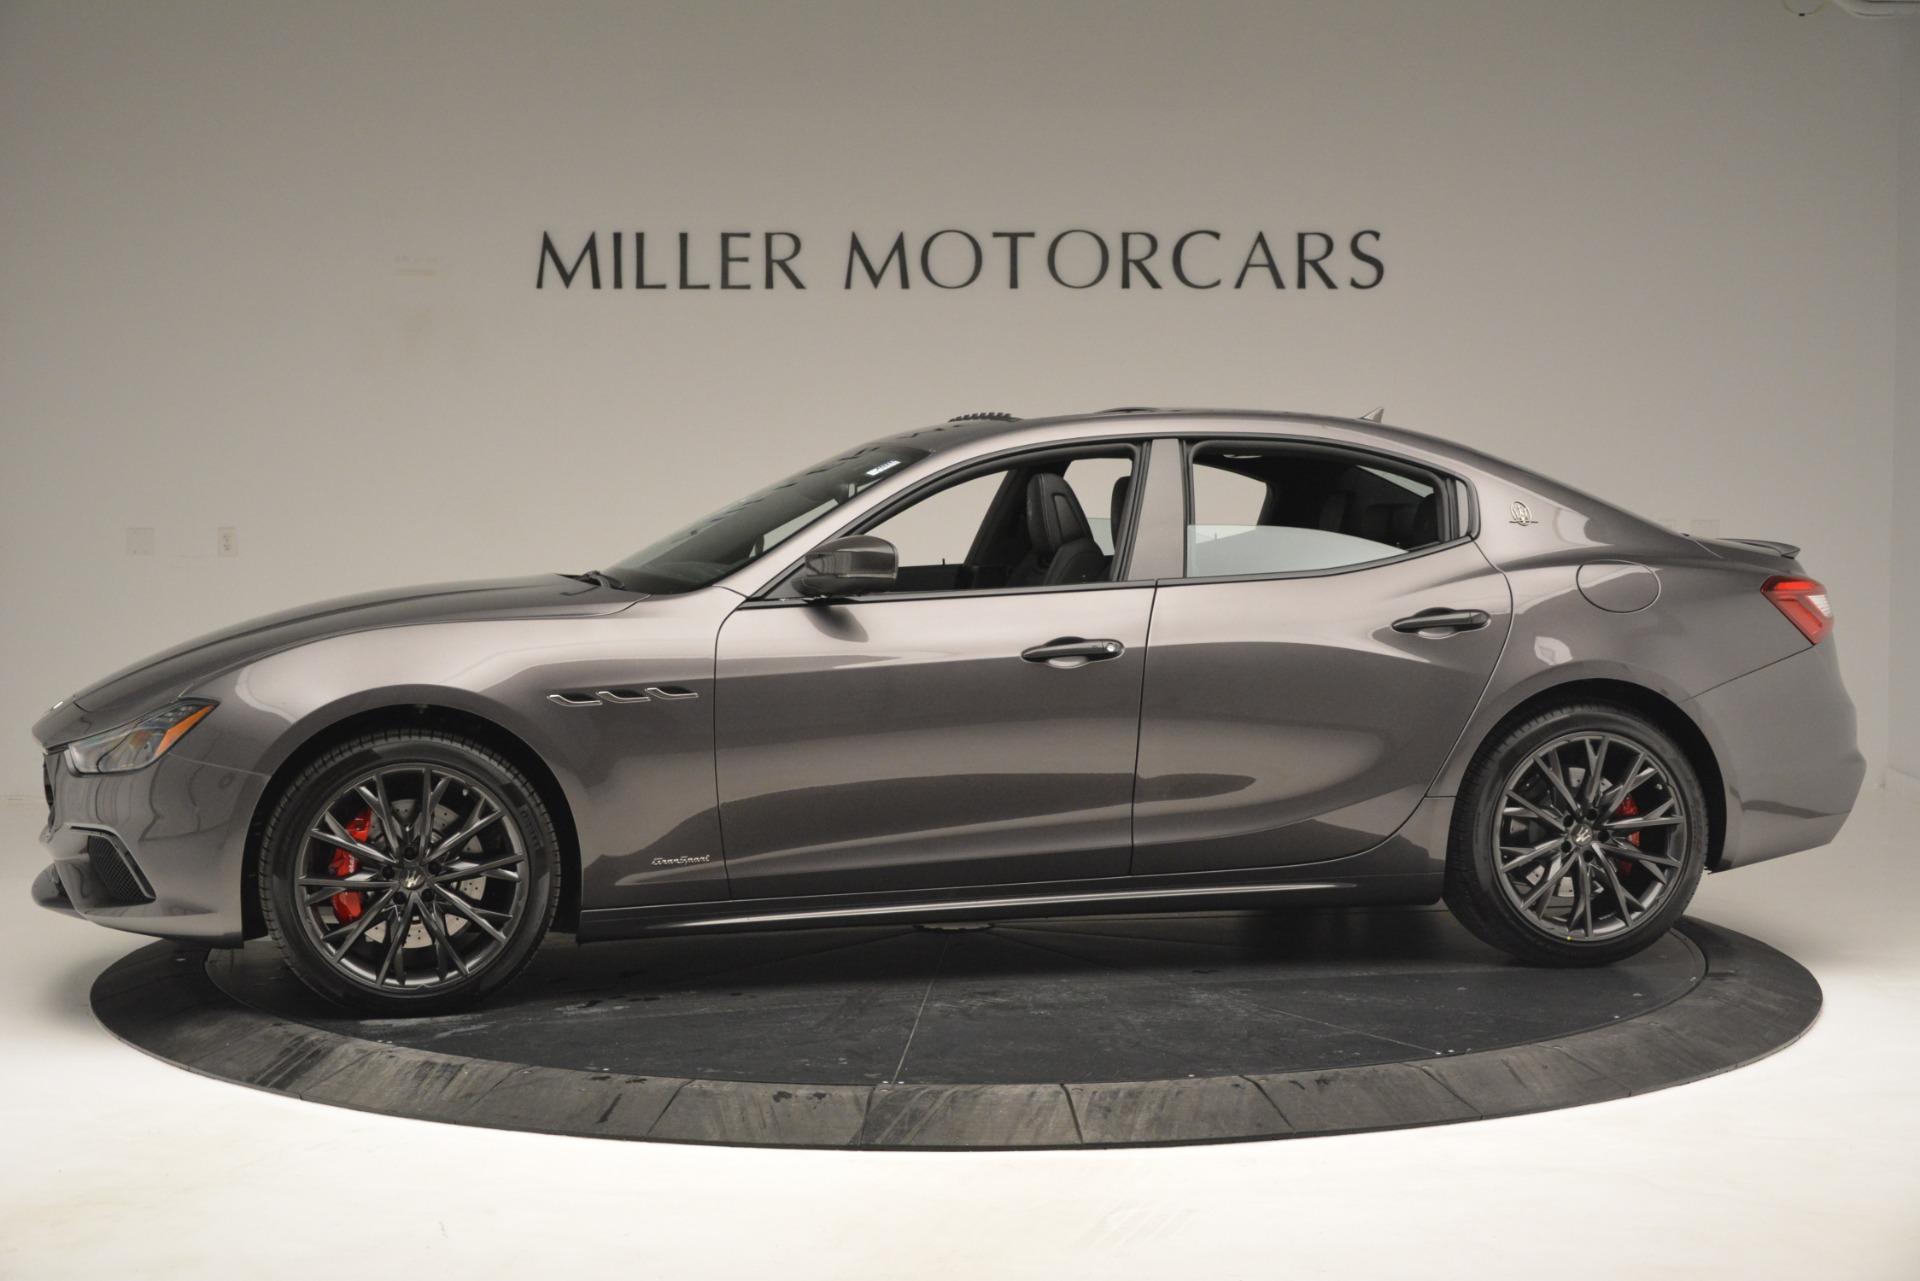 New 2019 Maserati Ghibli S Q4 GranSport For Sale In Westport, CT 2925_p3